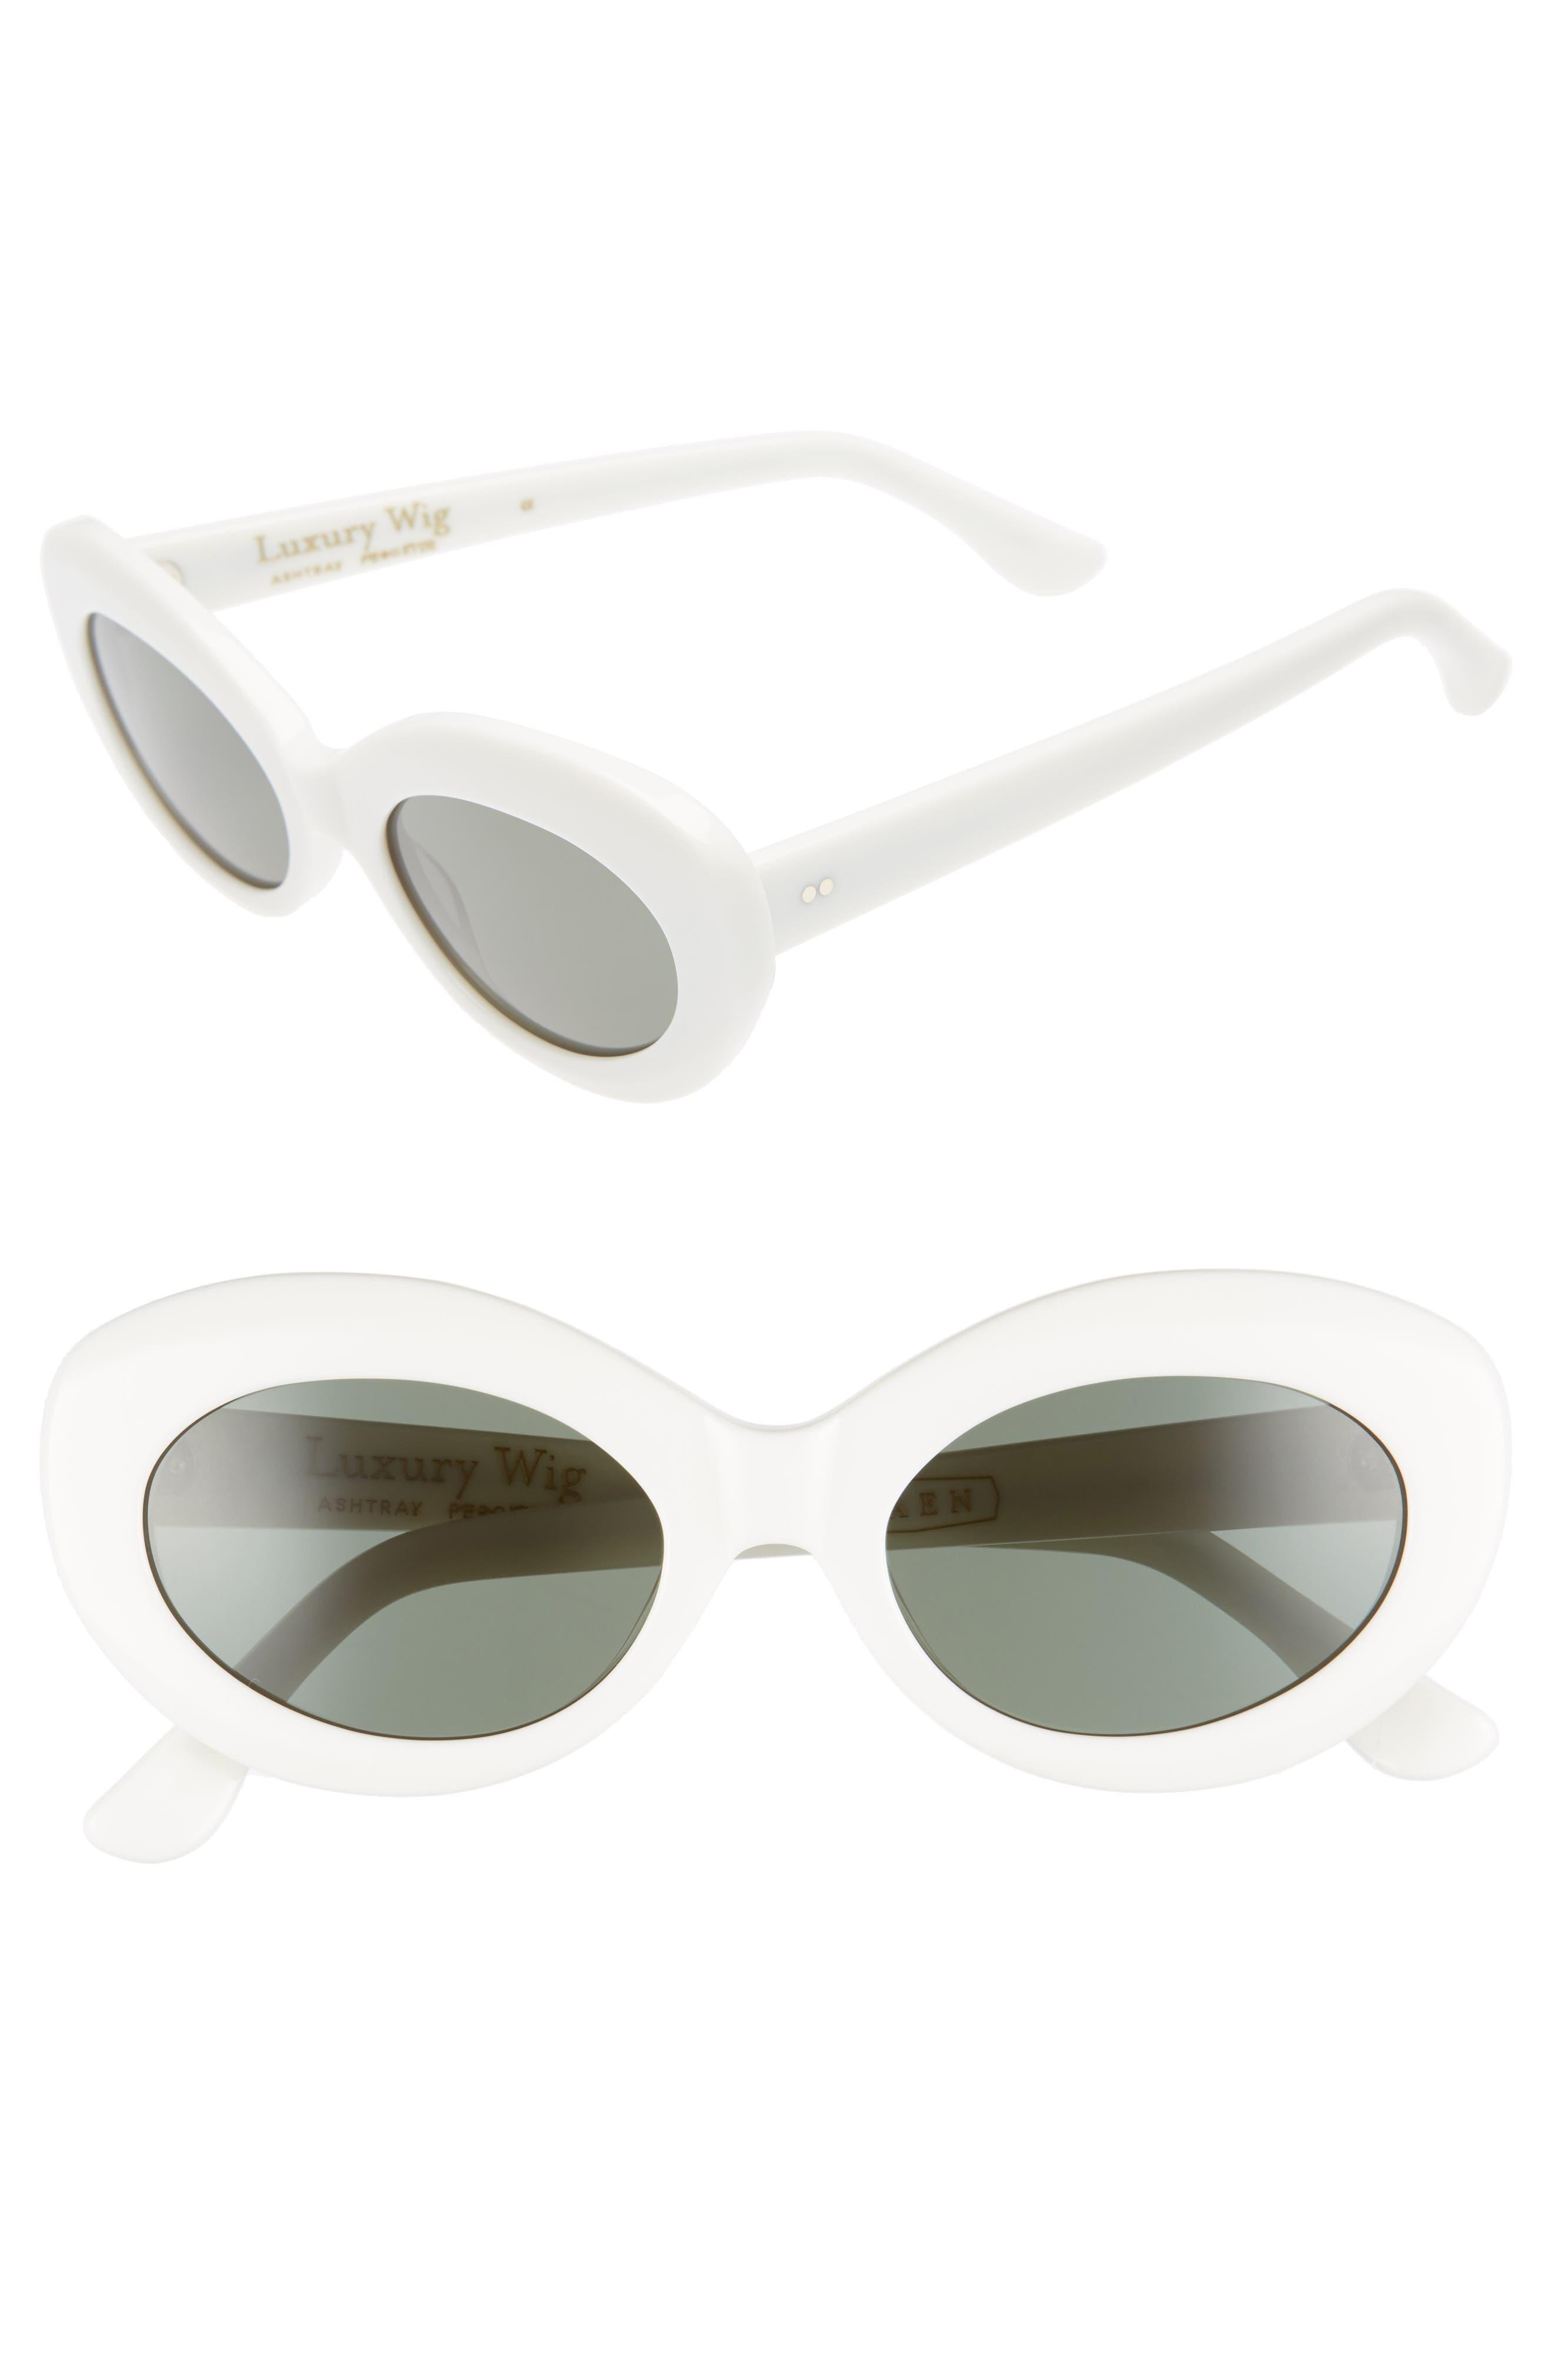 RAEN x Alex Knost Luxury Wig Ashtray 53mm Sunglasses